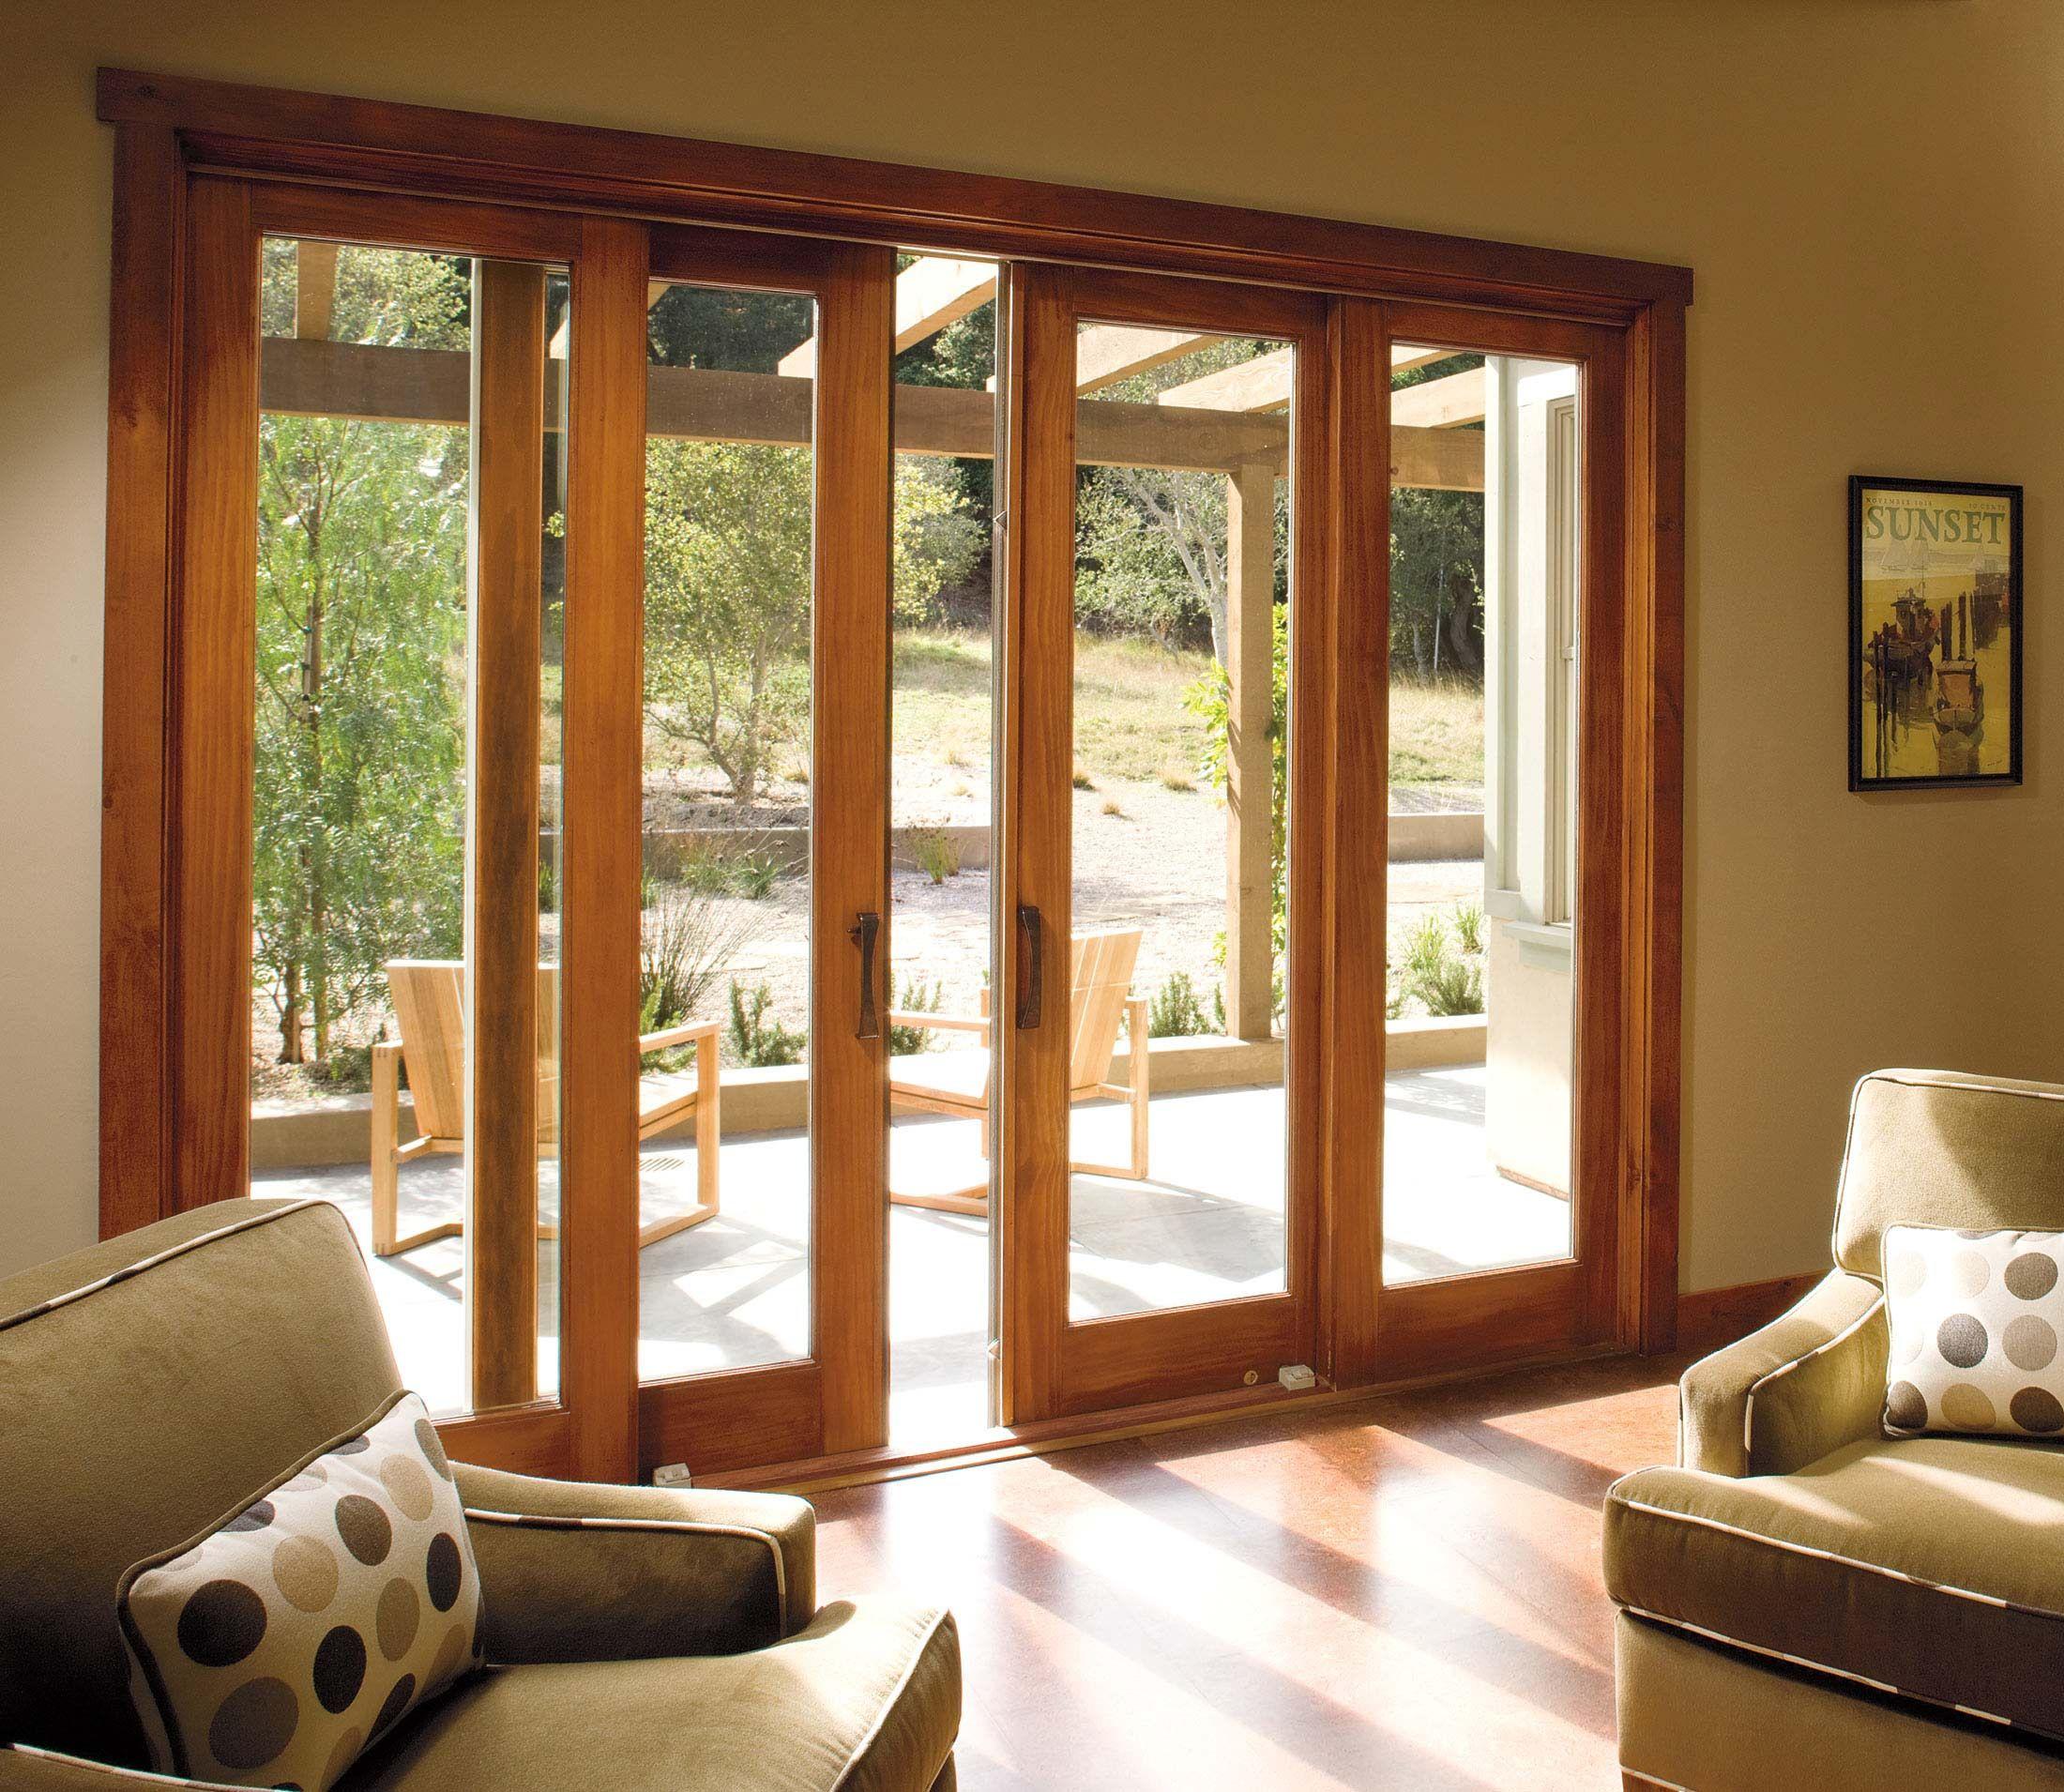 Replace french door w architect series sliding patio door